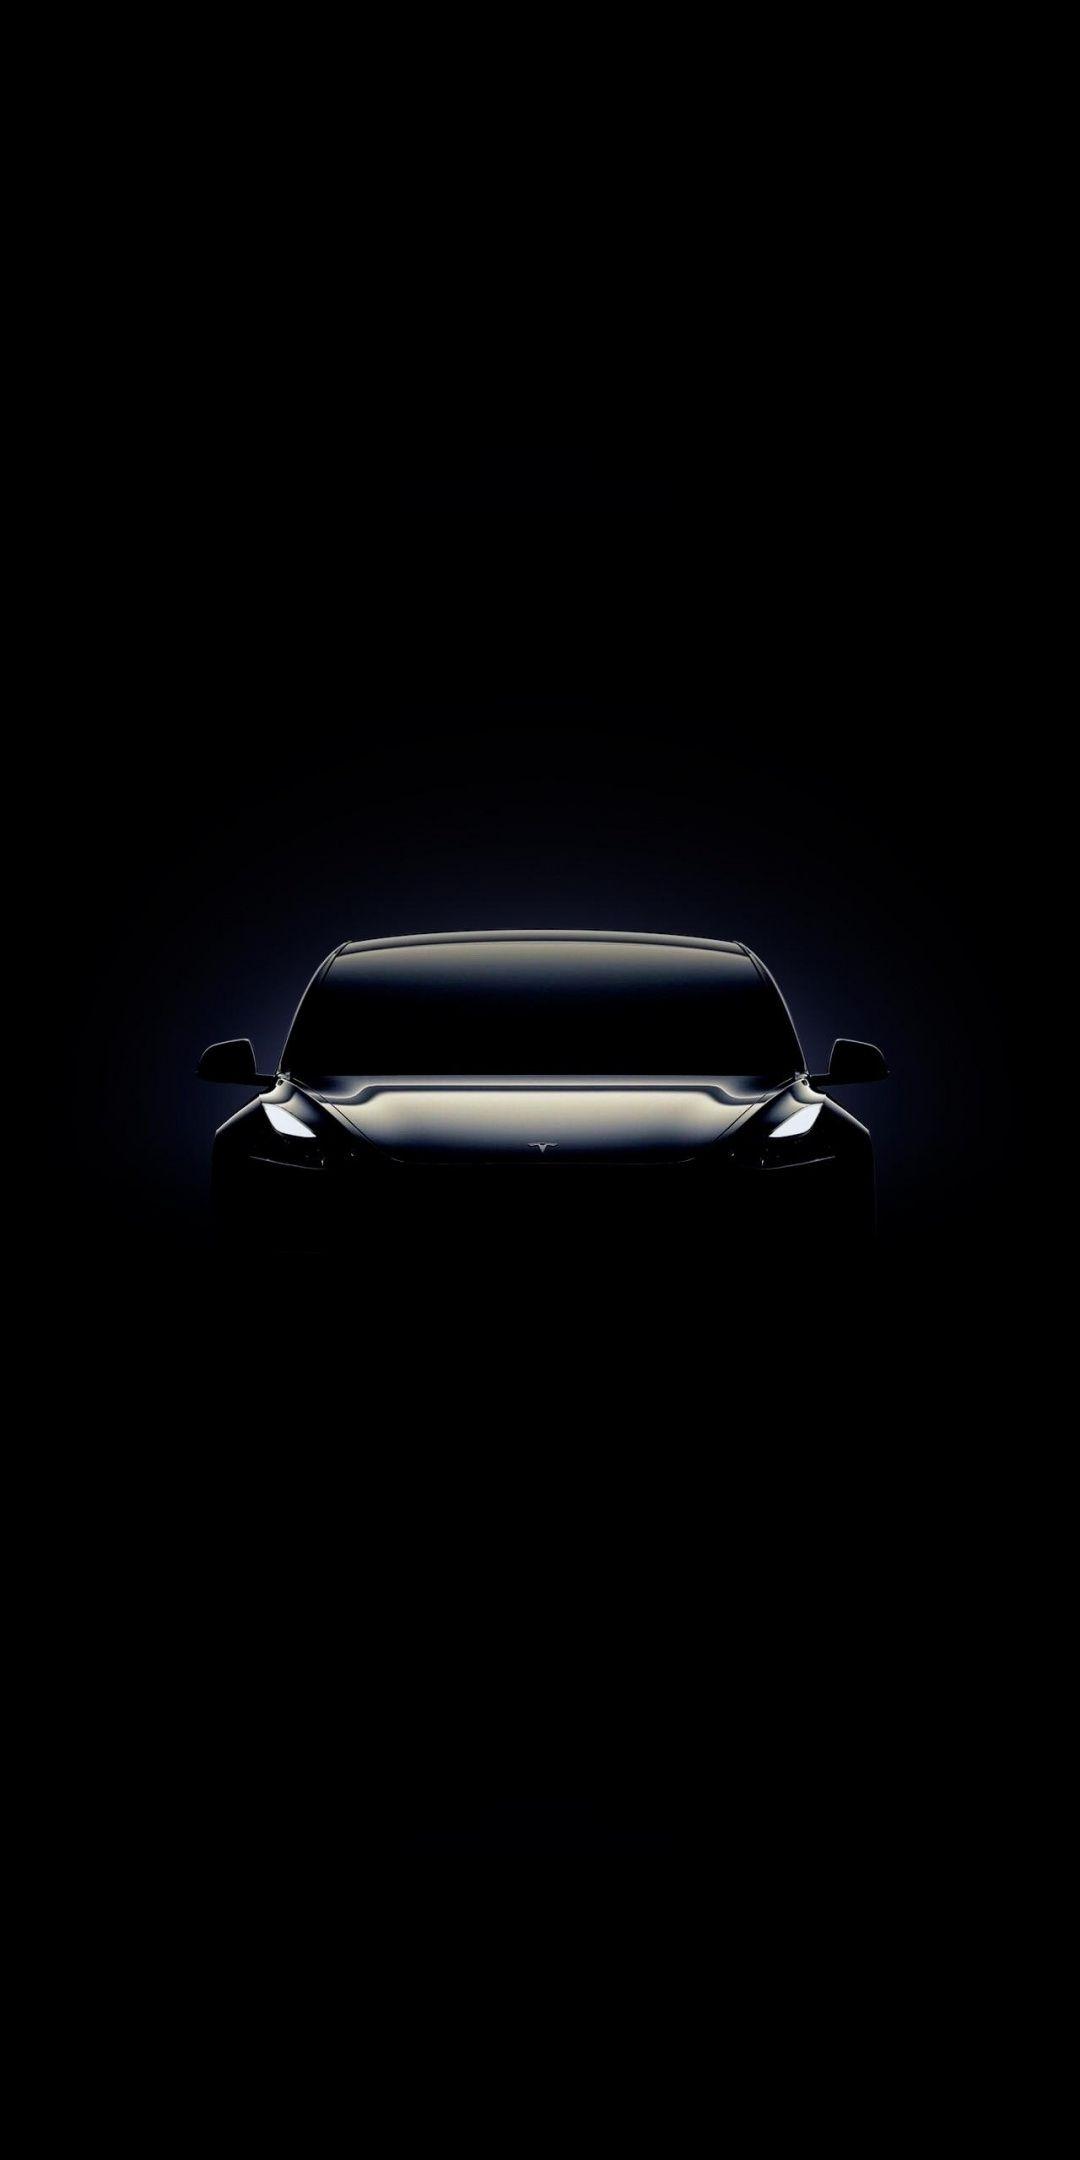 "Porsche 911 carrera 4s 1920x1080"">. Black Car Wallpaper 4k For Mobile"